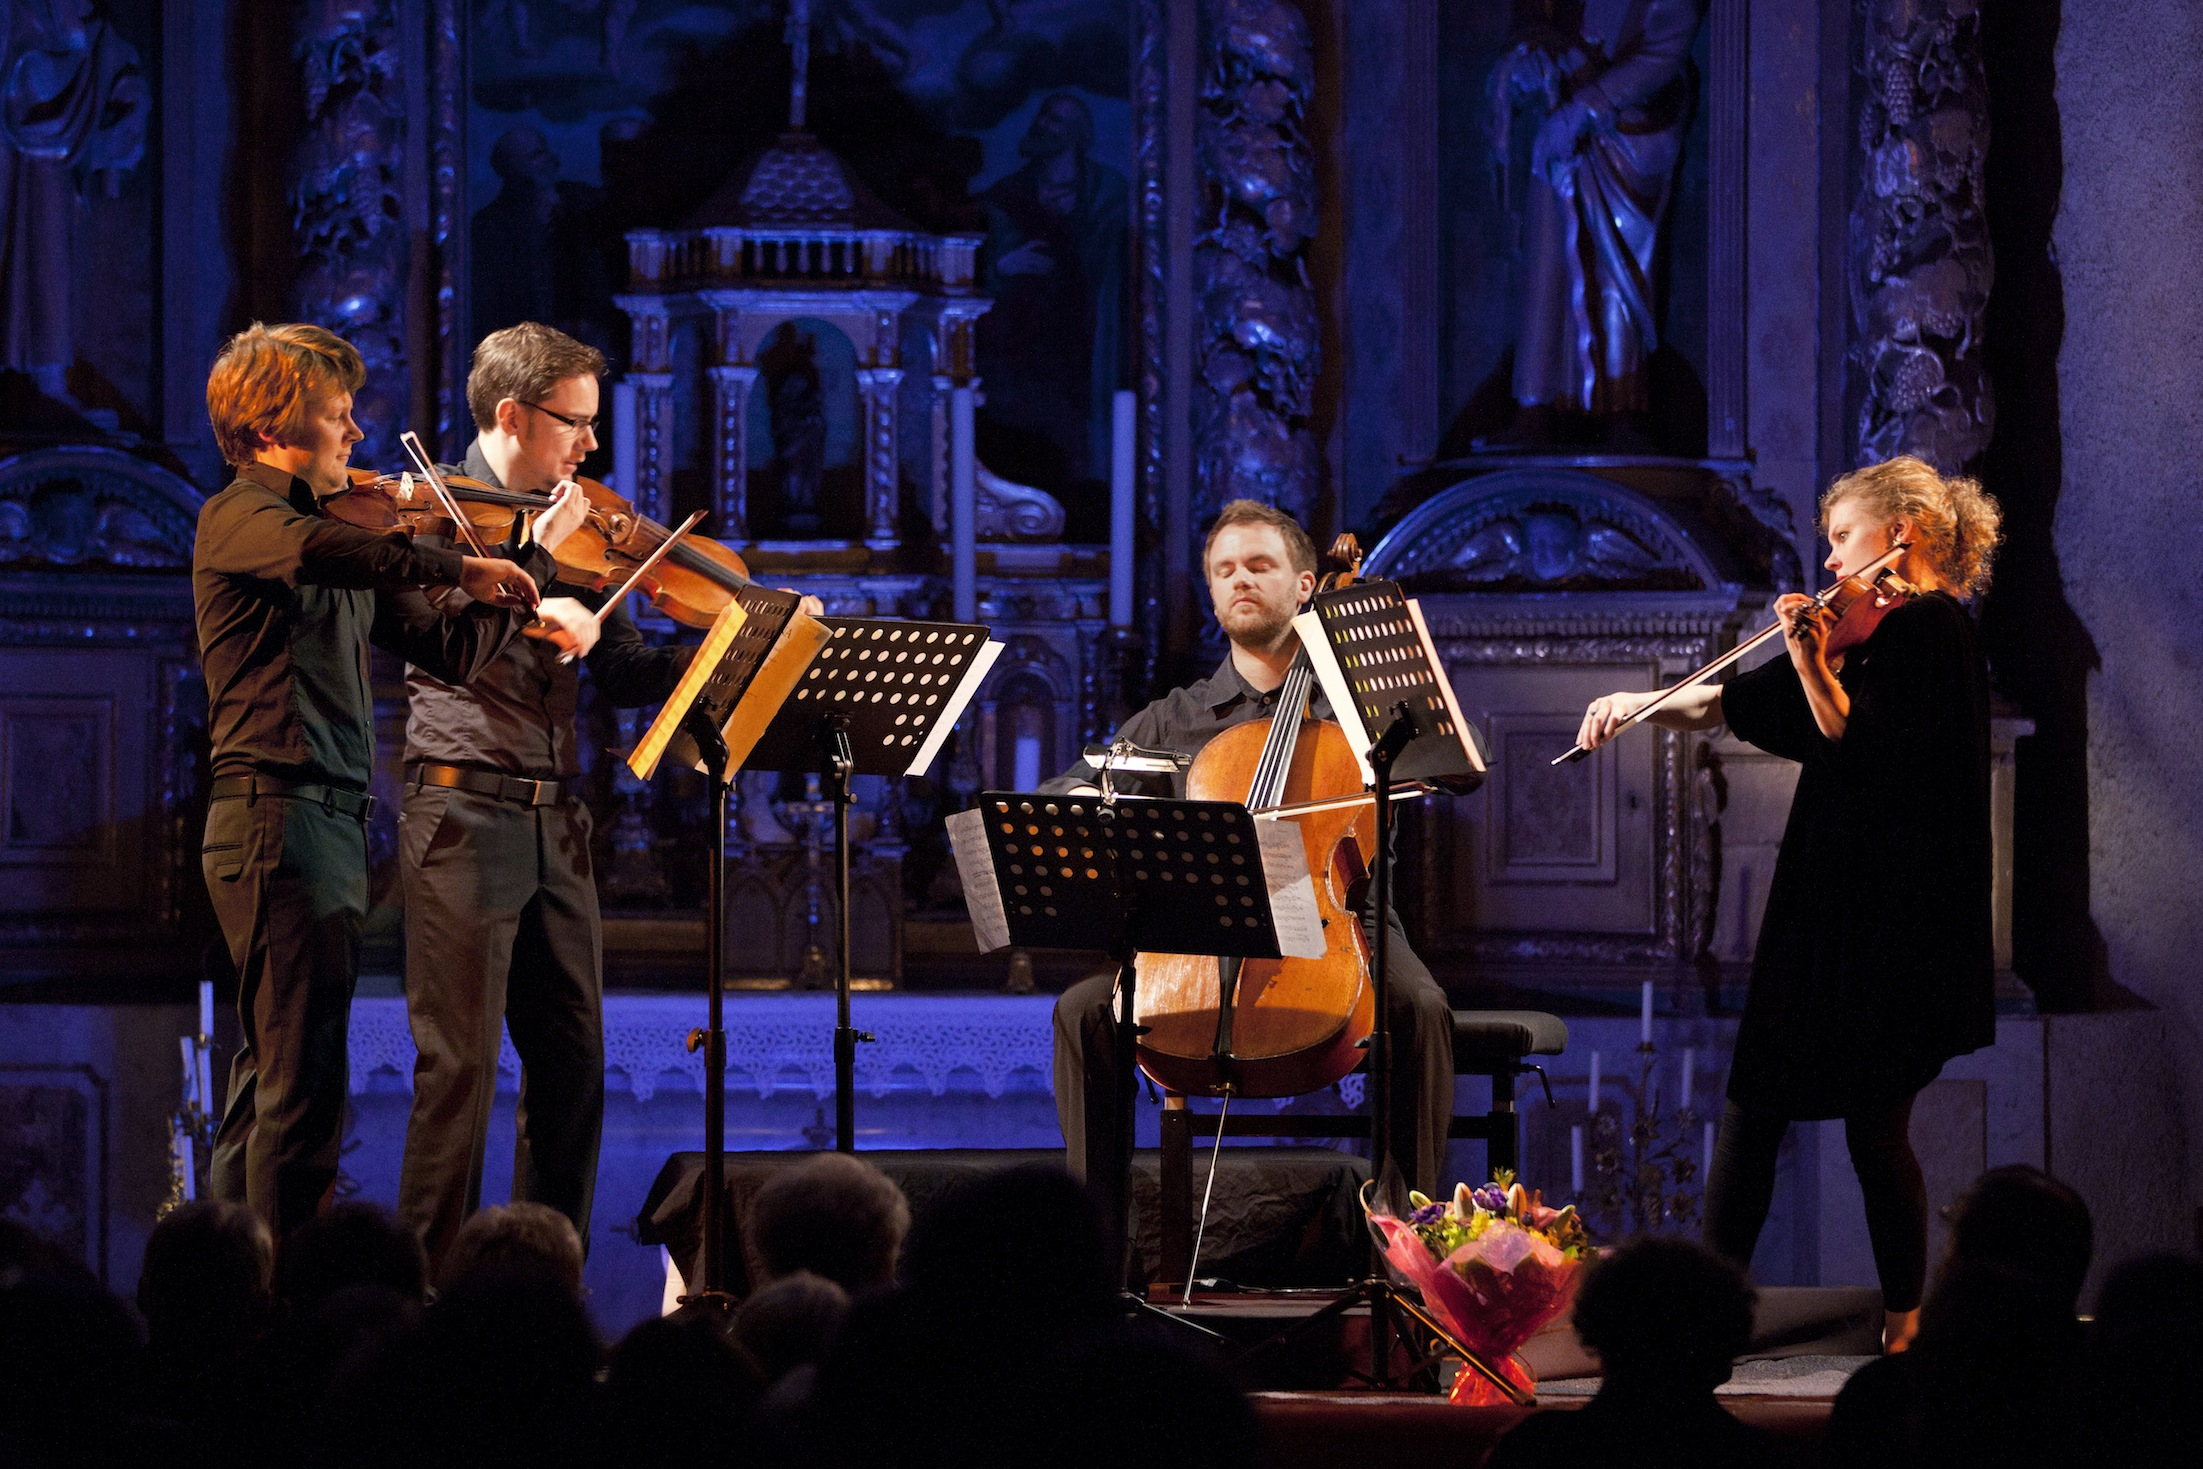 Festival de quatuors à cordes